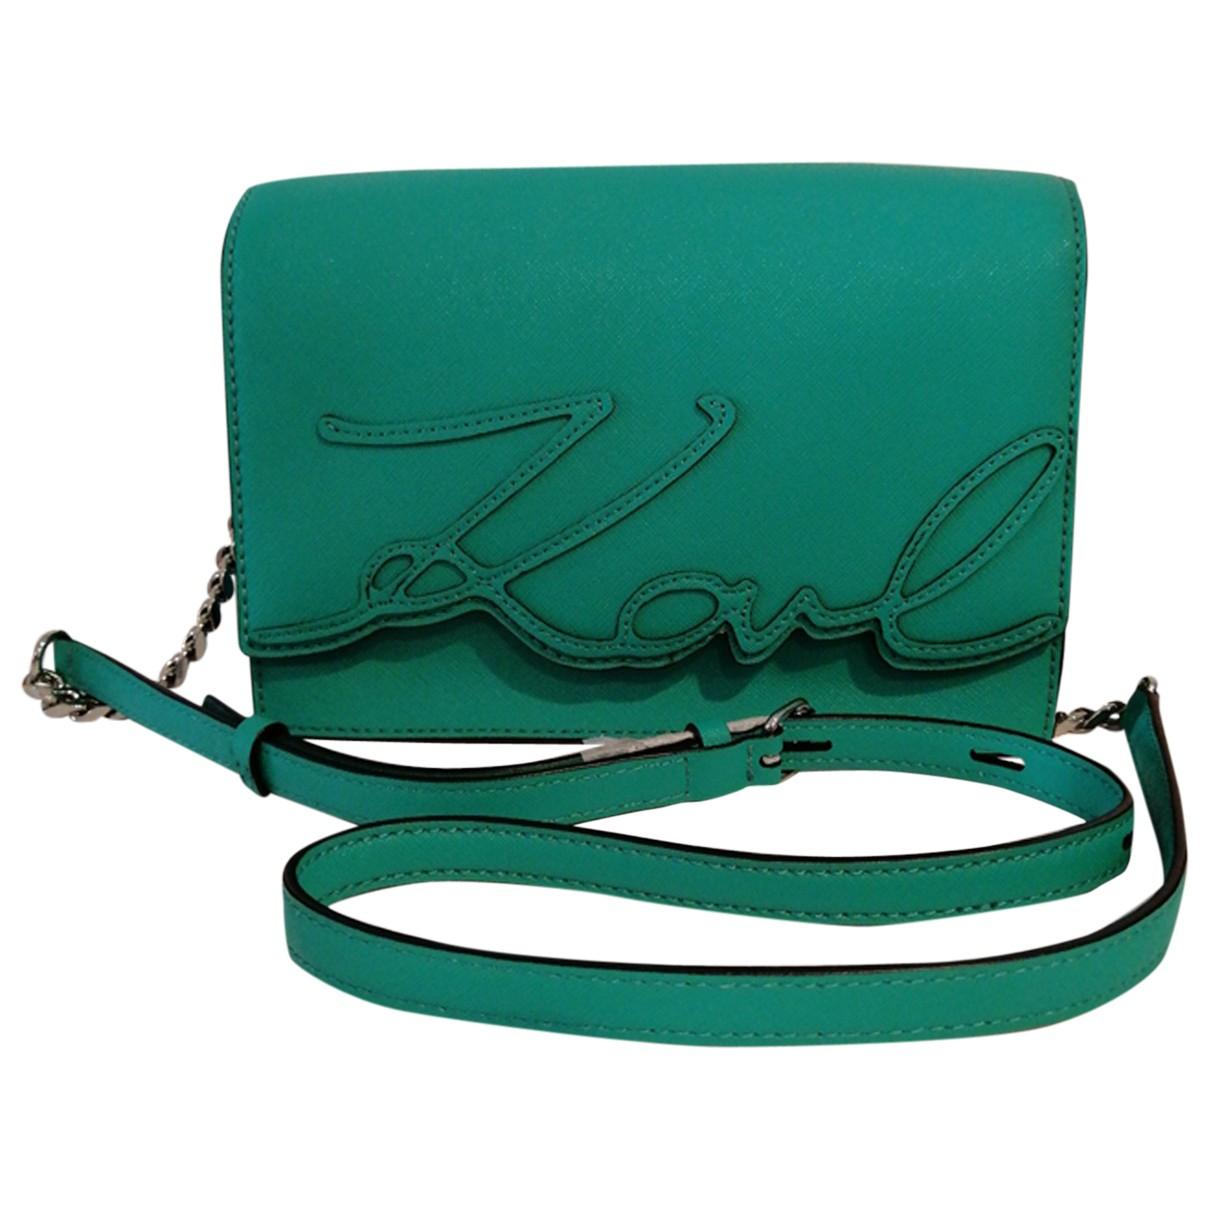 Karl Lagerfeld \N Green Leather Clutch bag for Women \N